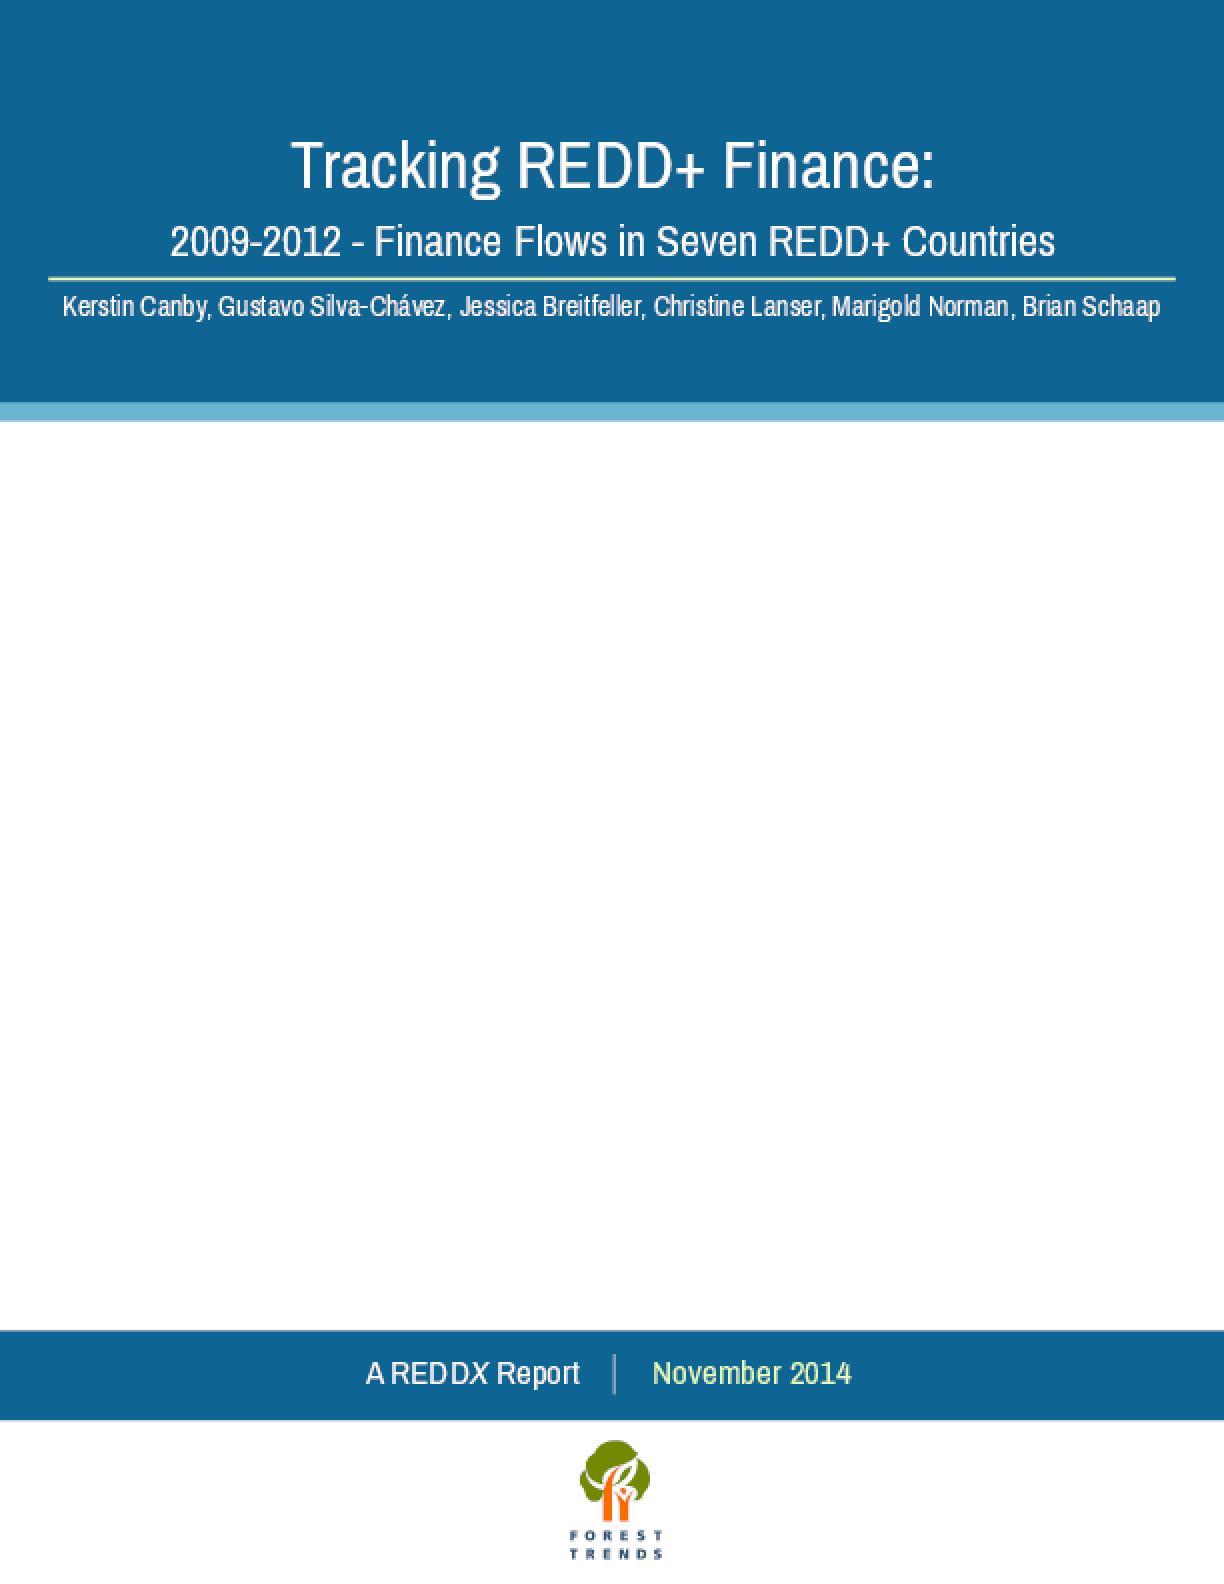 Tracking REDD+ Finance: 2009-2012 - Finance Flows in Seven REDD+ Countries